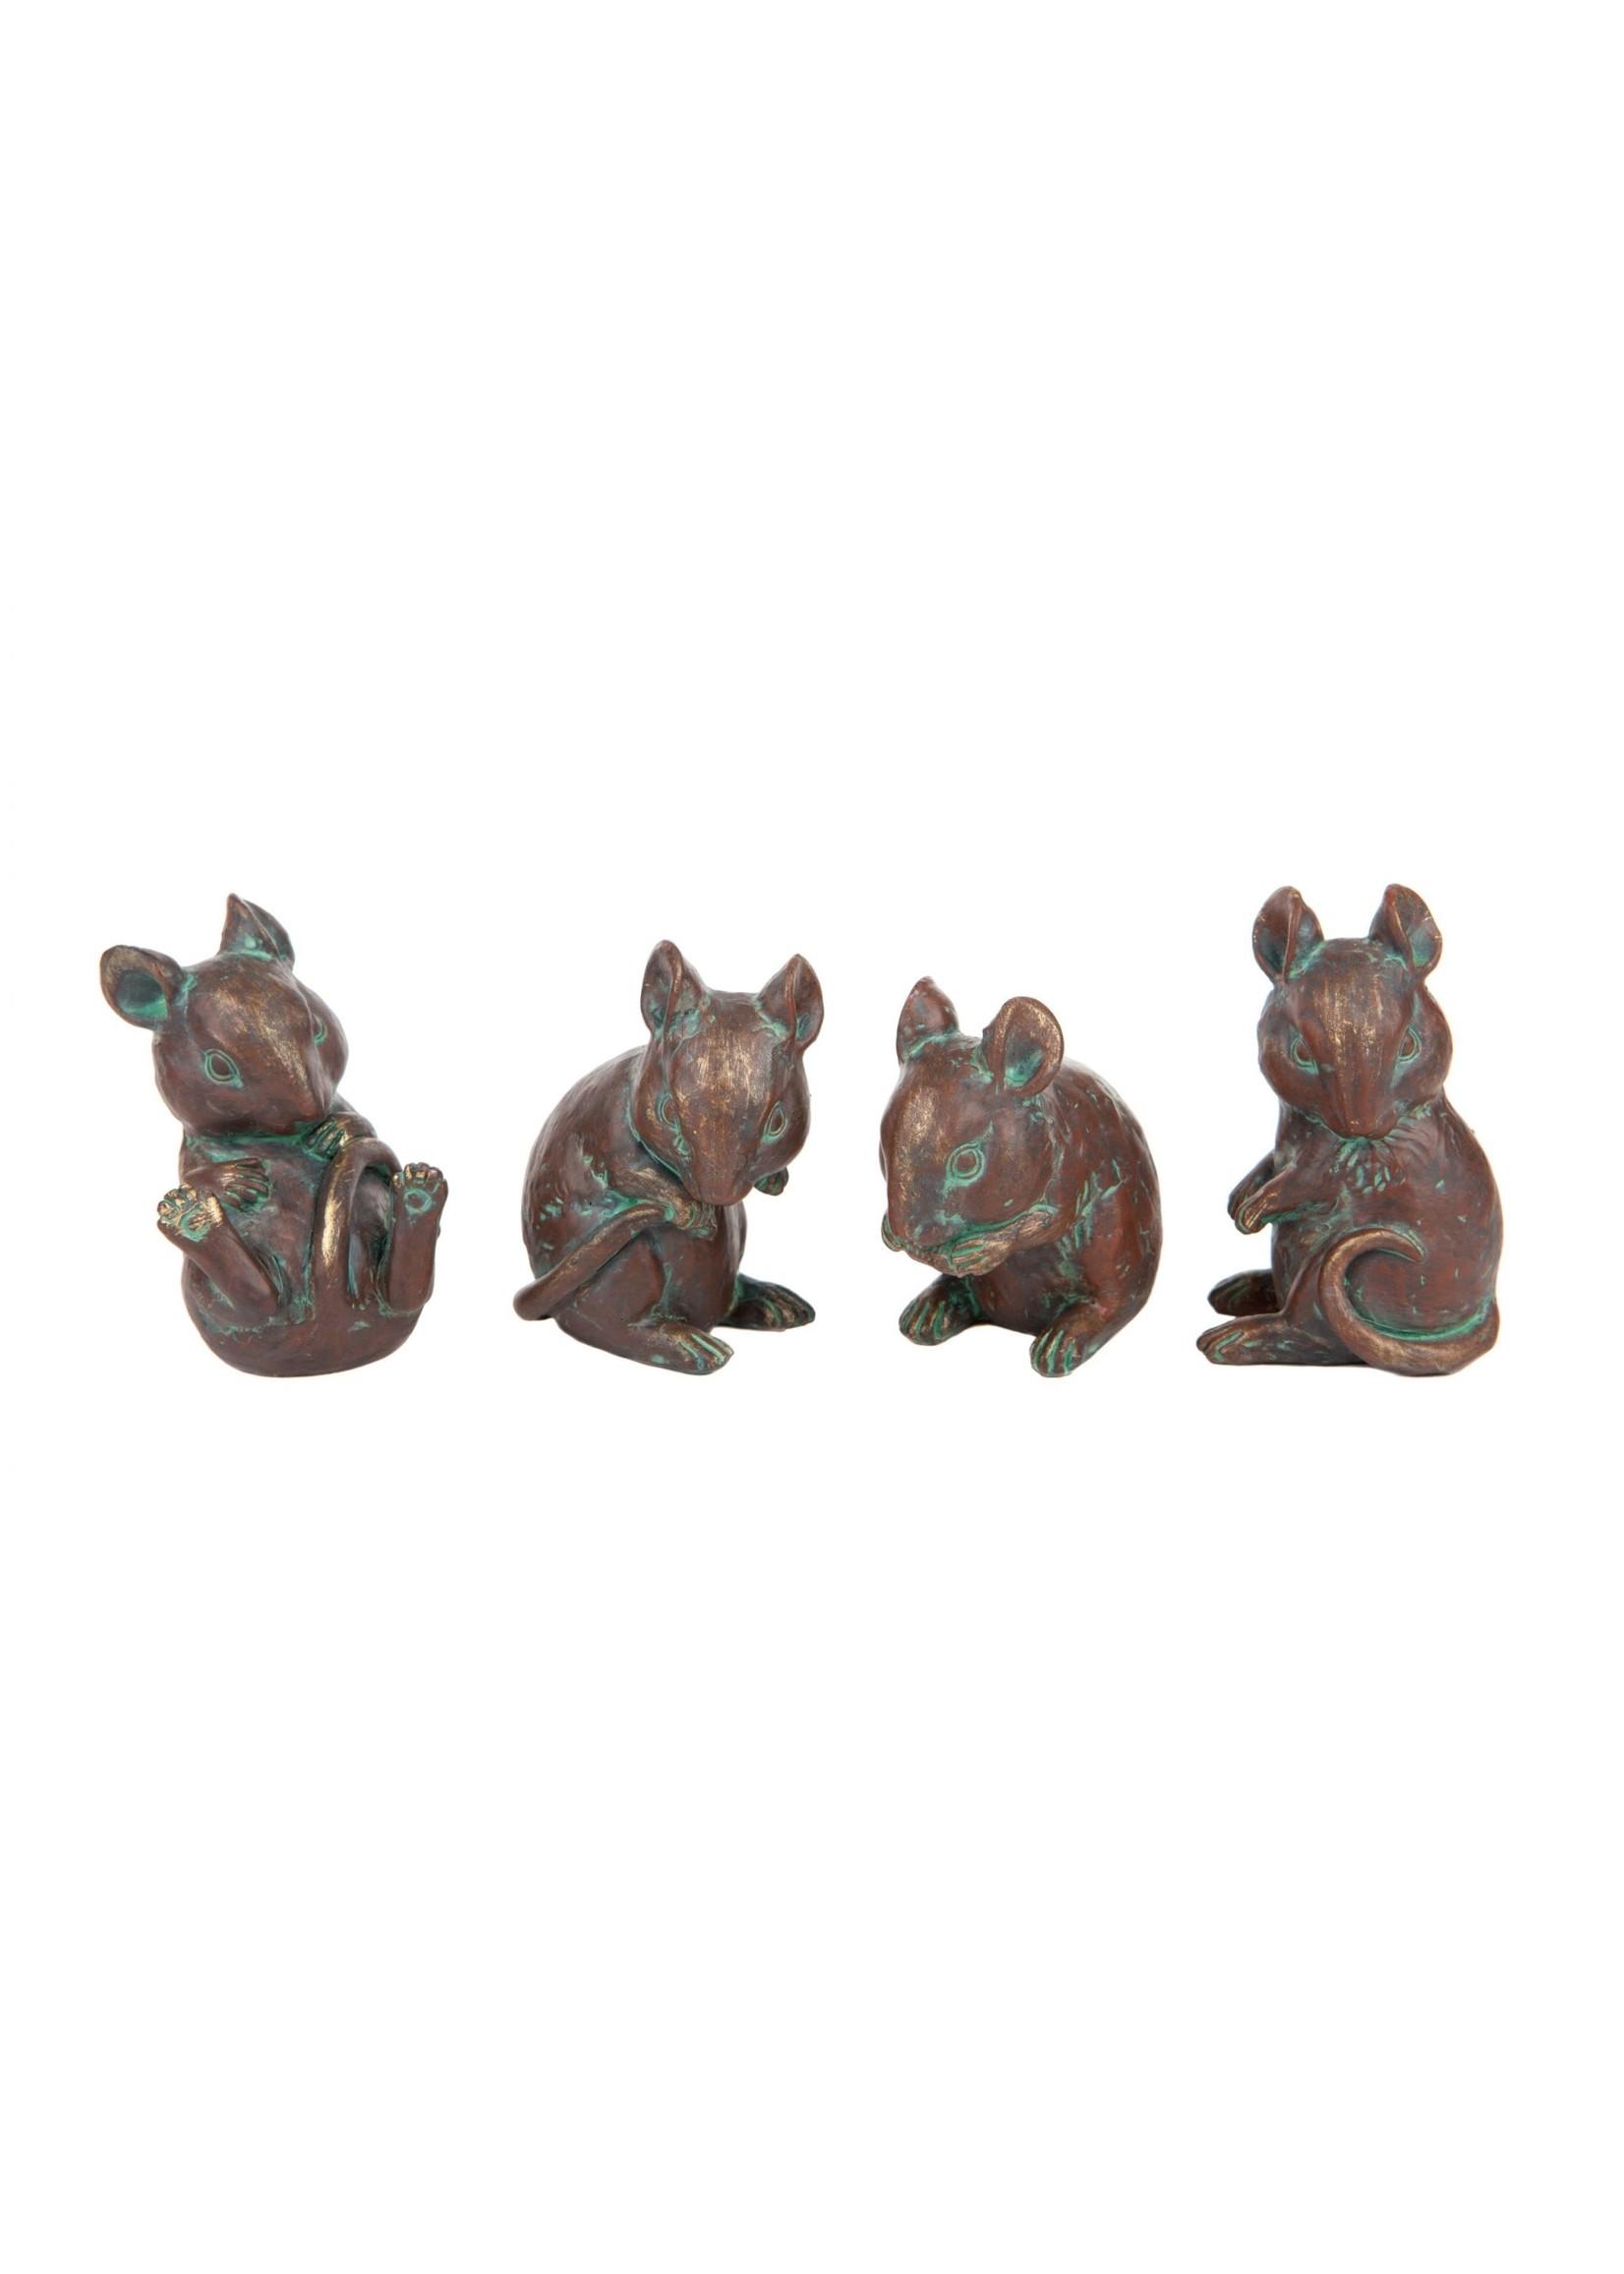 Mice set of 4